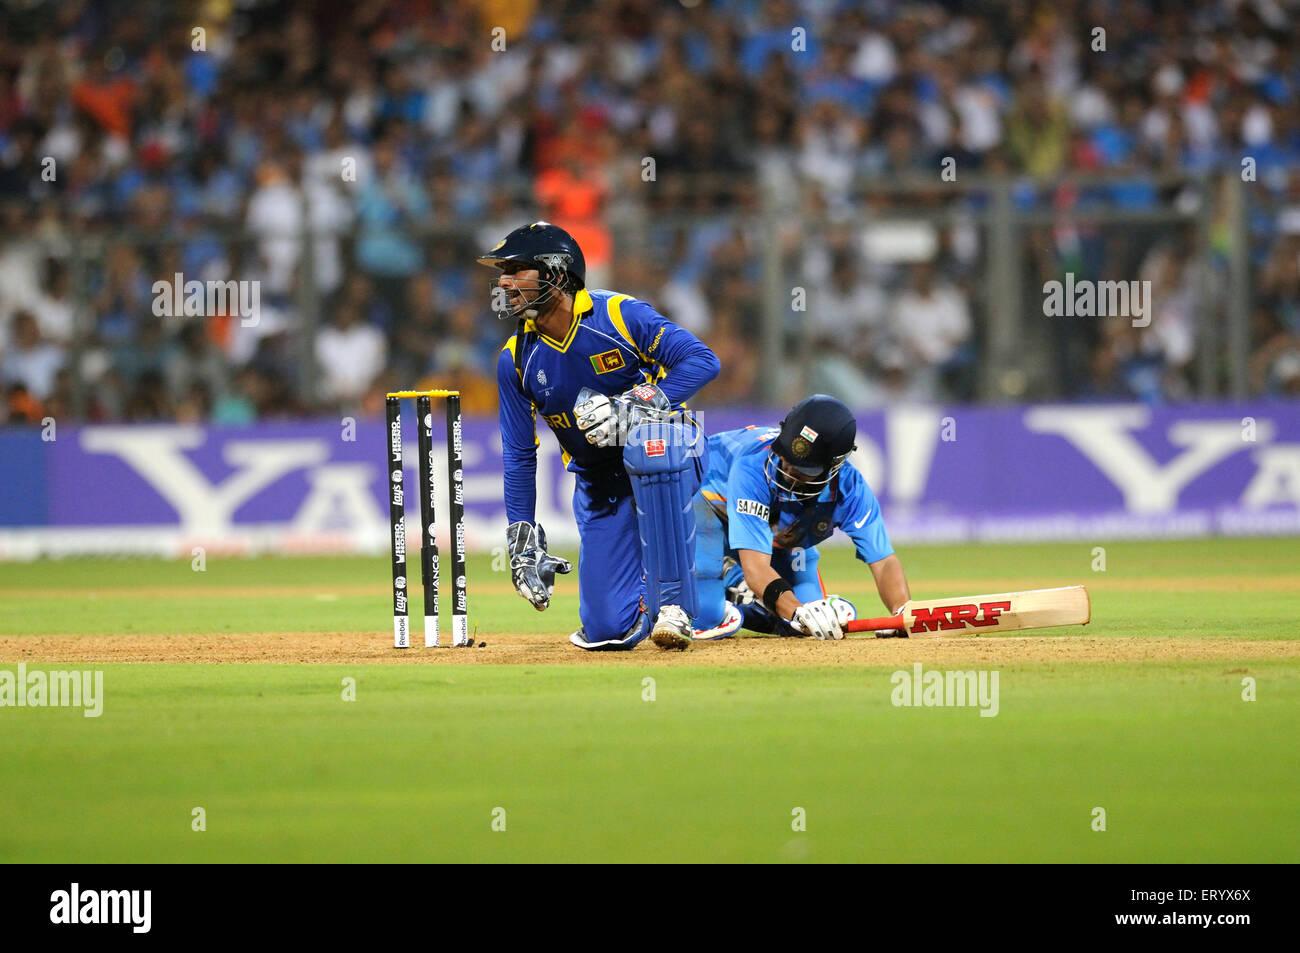 batsman Gautam Gambhir L successfully reaches run attempt wicketkeeper ICC Cricket World Cup 2011 Wankhede Stadium - Stock Image